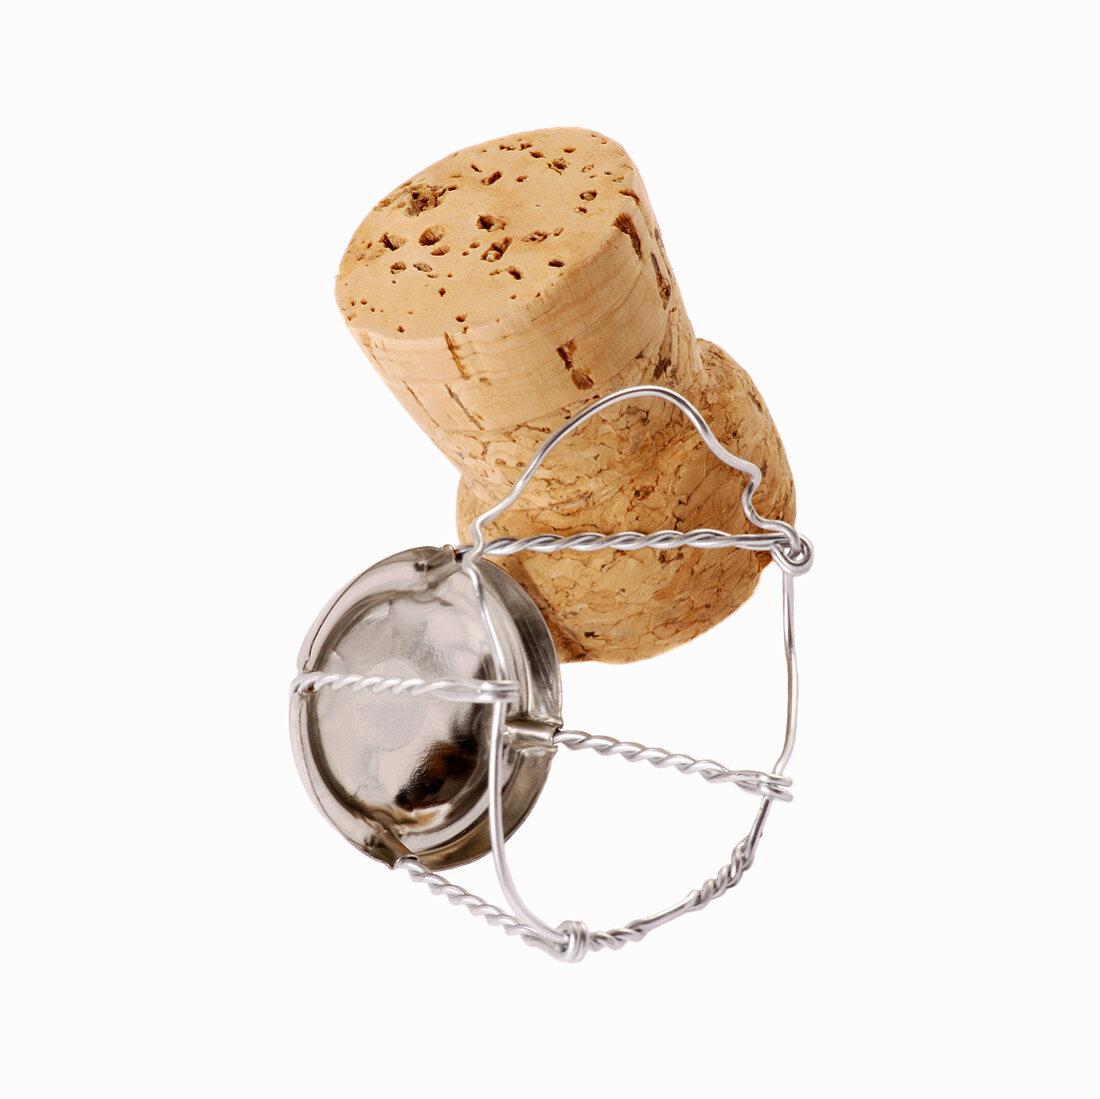 A champagne cork